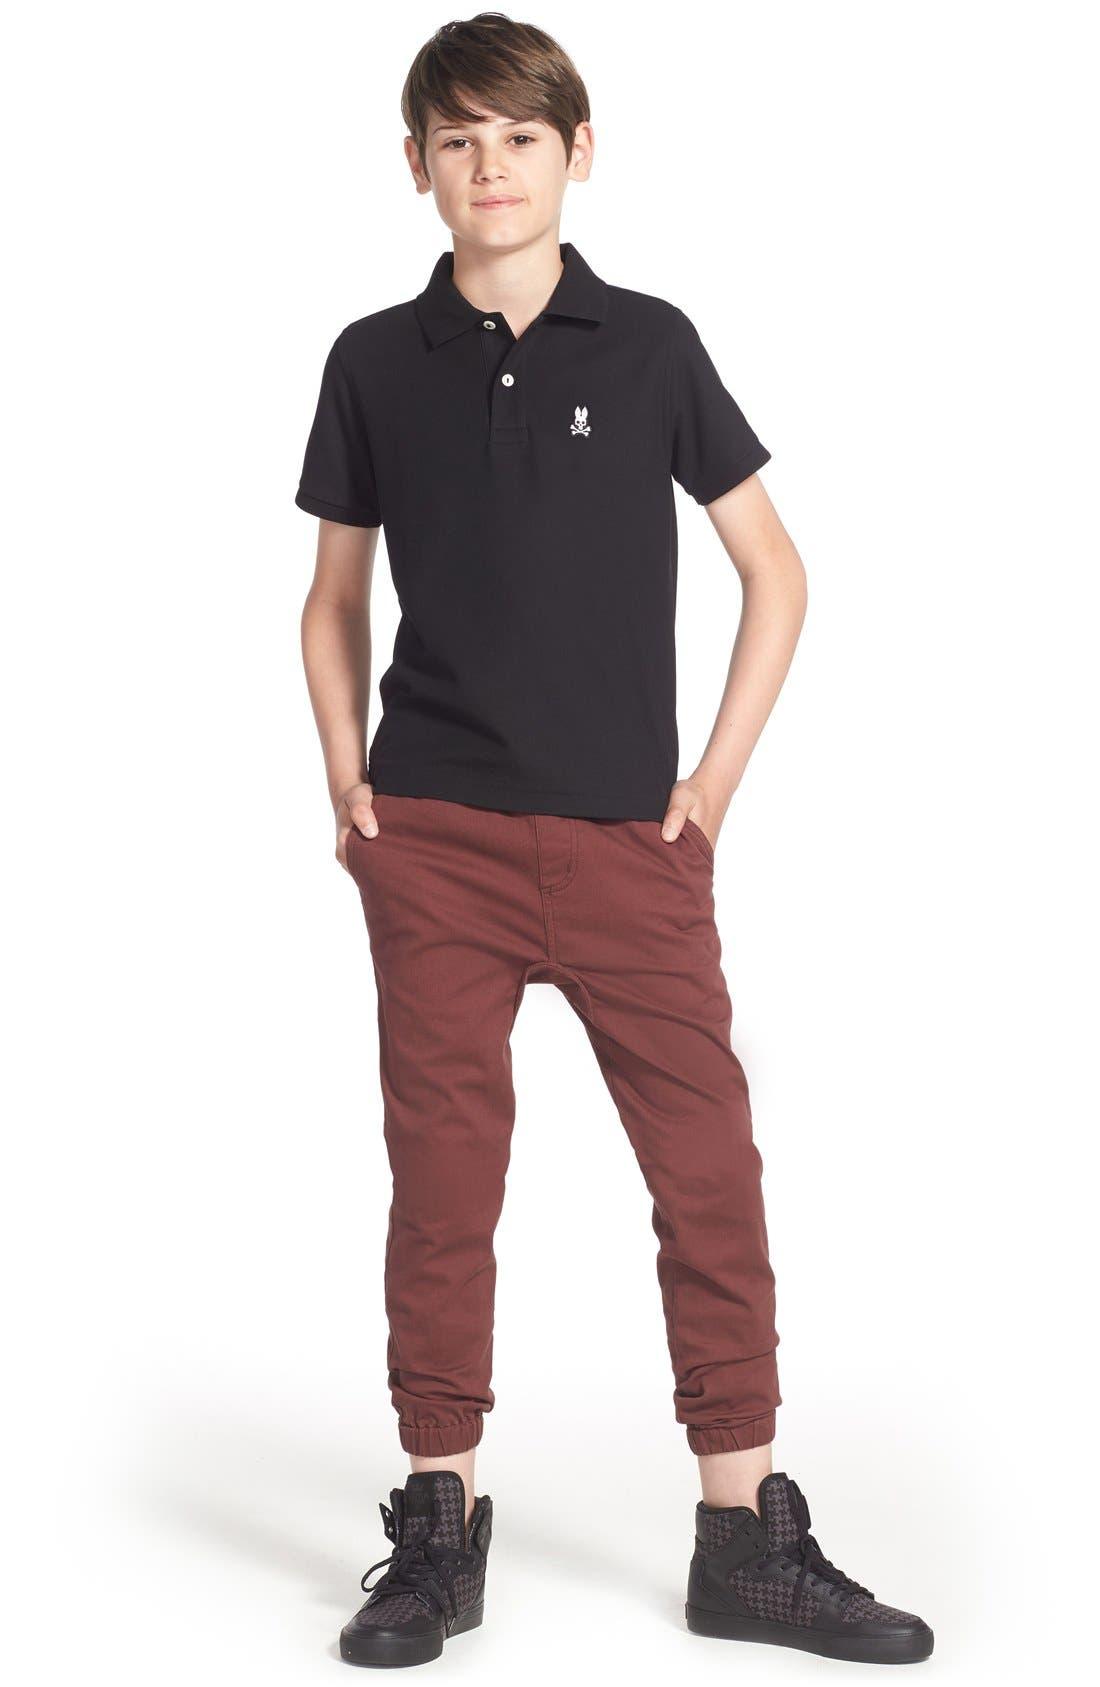 Volcom Polo, Tucker + Tate Jogger Pants & Accessories